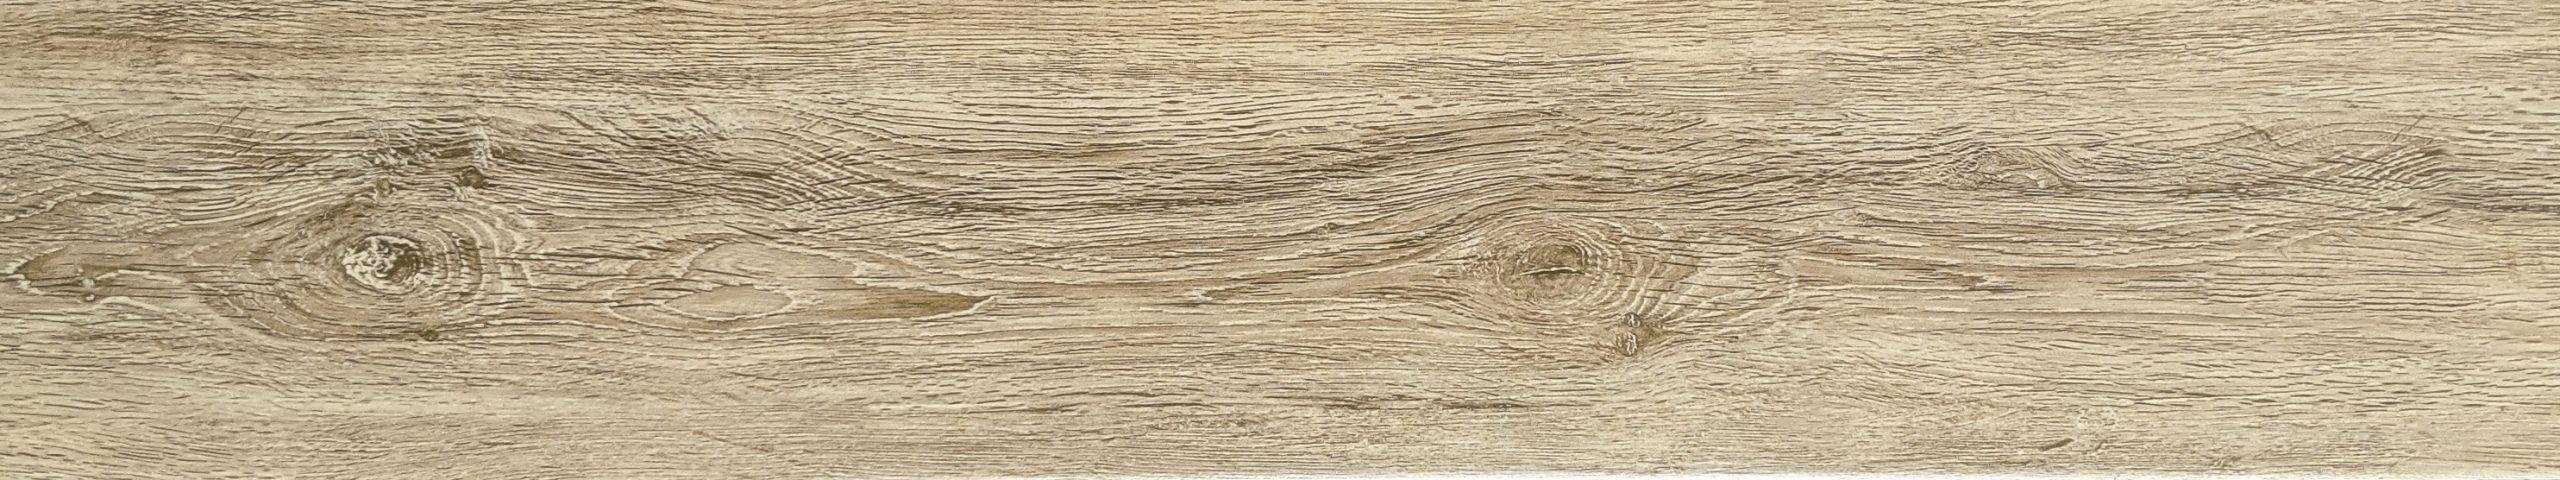 Map gạch gỗ KHA-58105 150x800